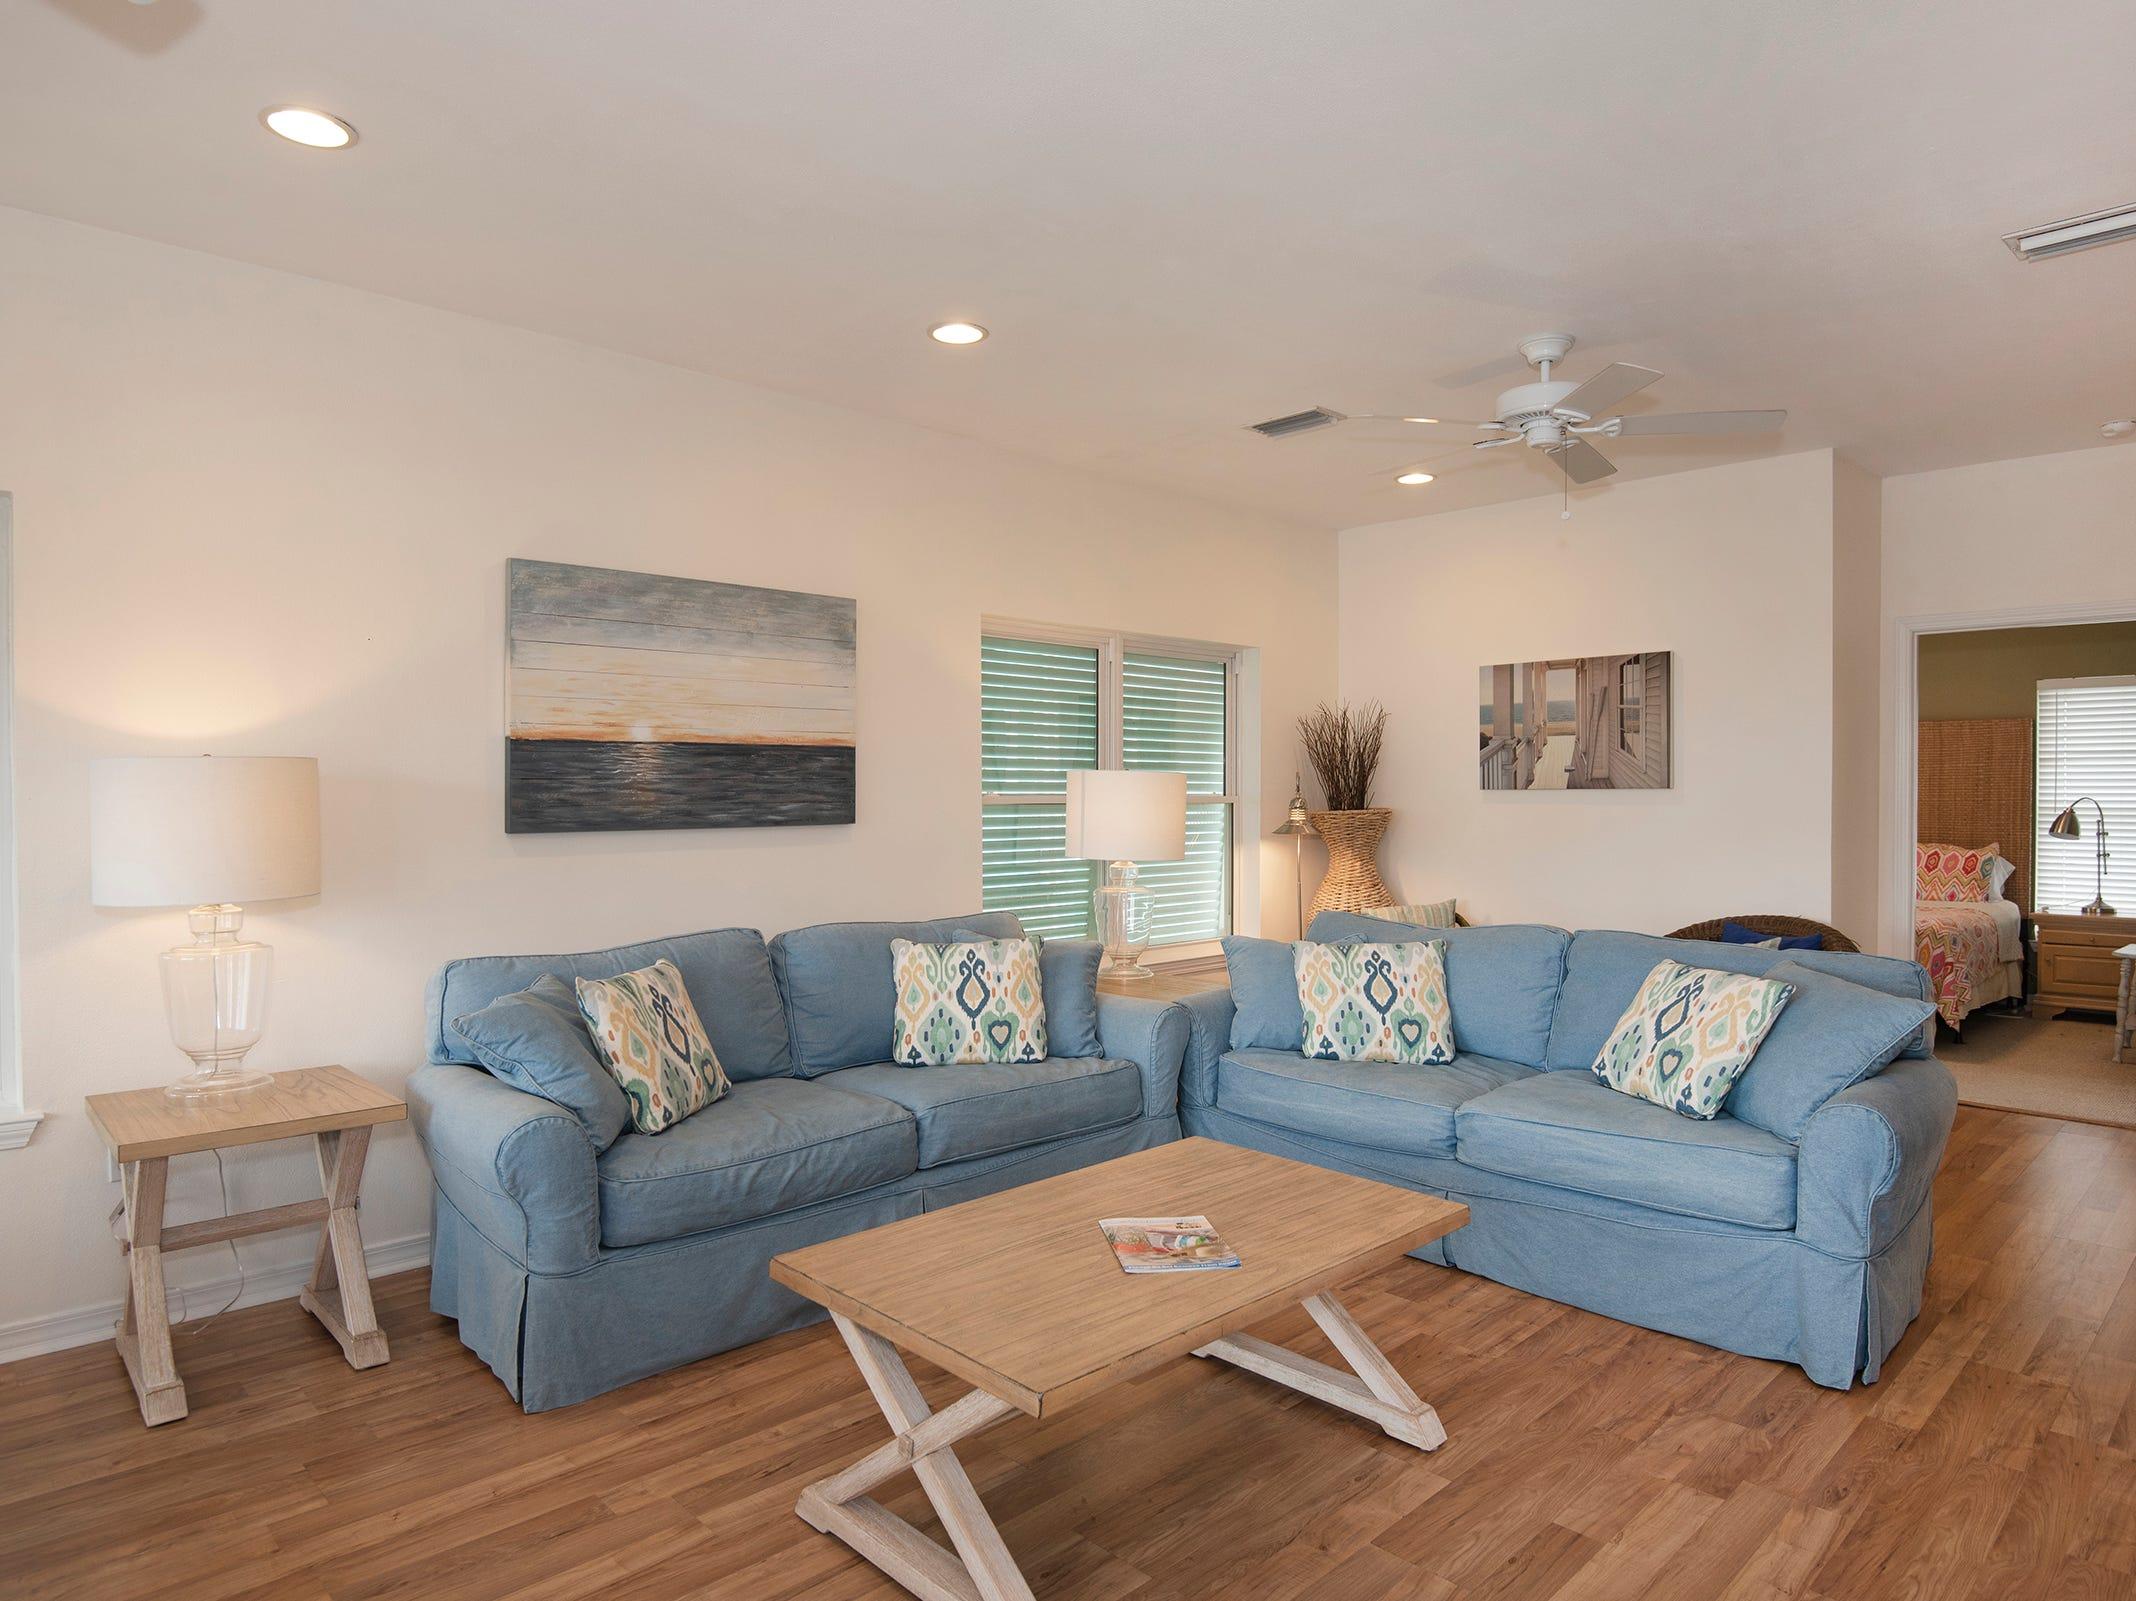 14 Ensenada MarbellaThe living area is open and inviting.